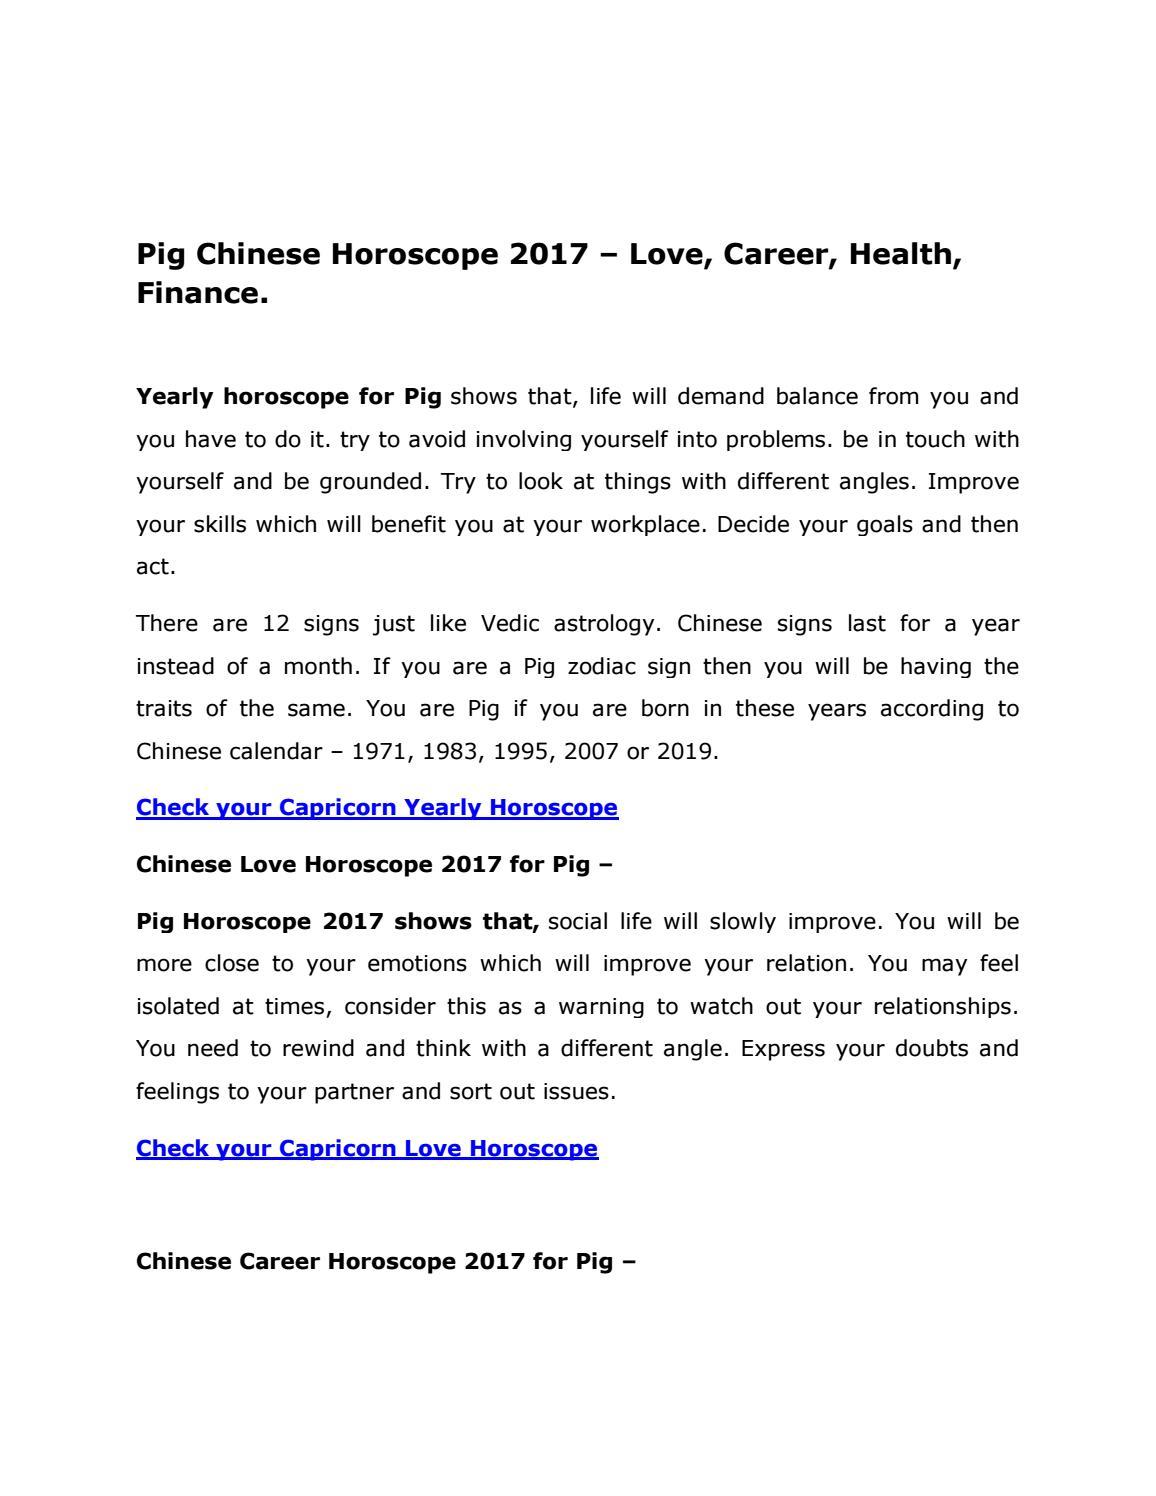 Pig Chinese Horoscope 2017 By Astrovidhi Issuu